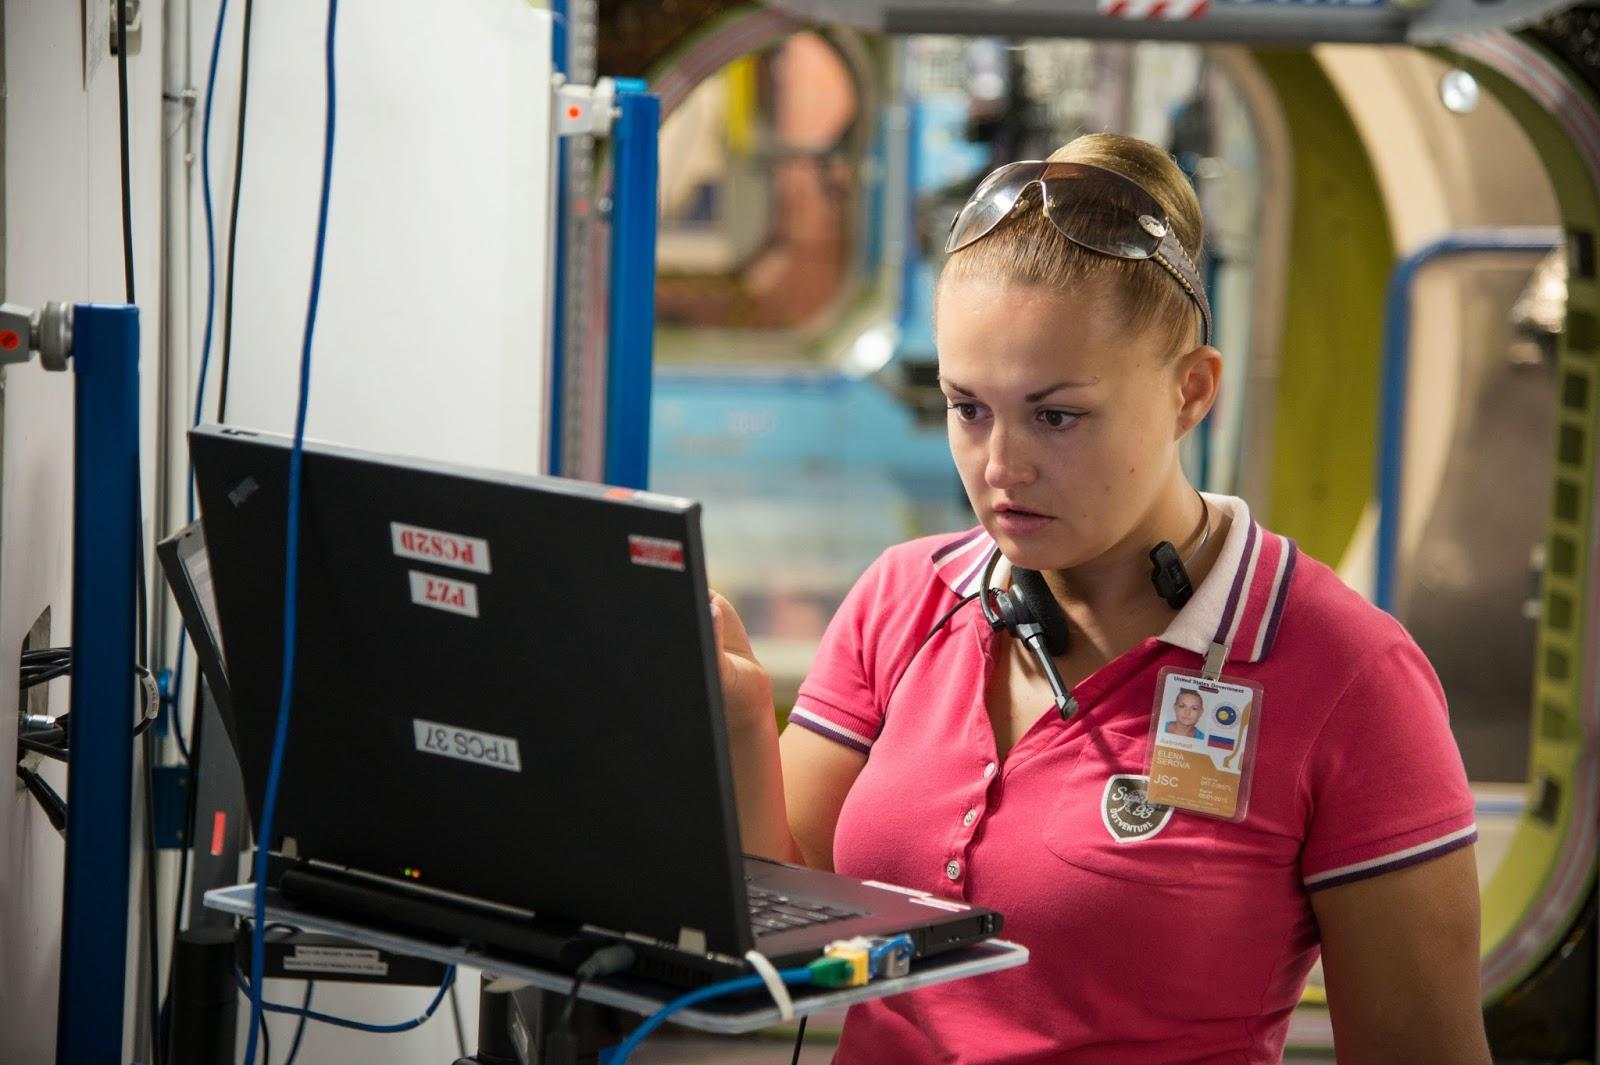 tx women astronauts - photo #28